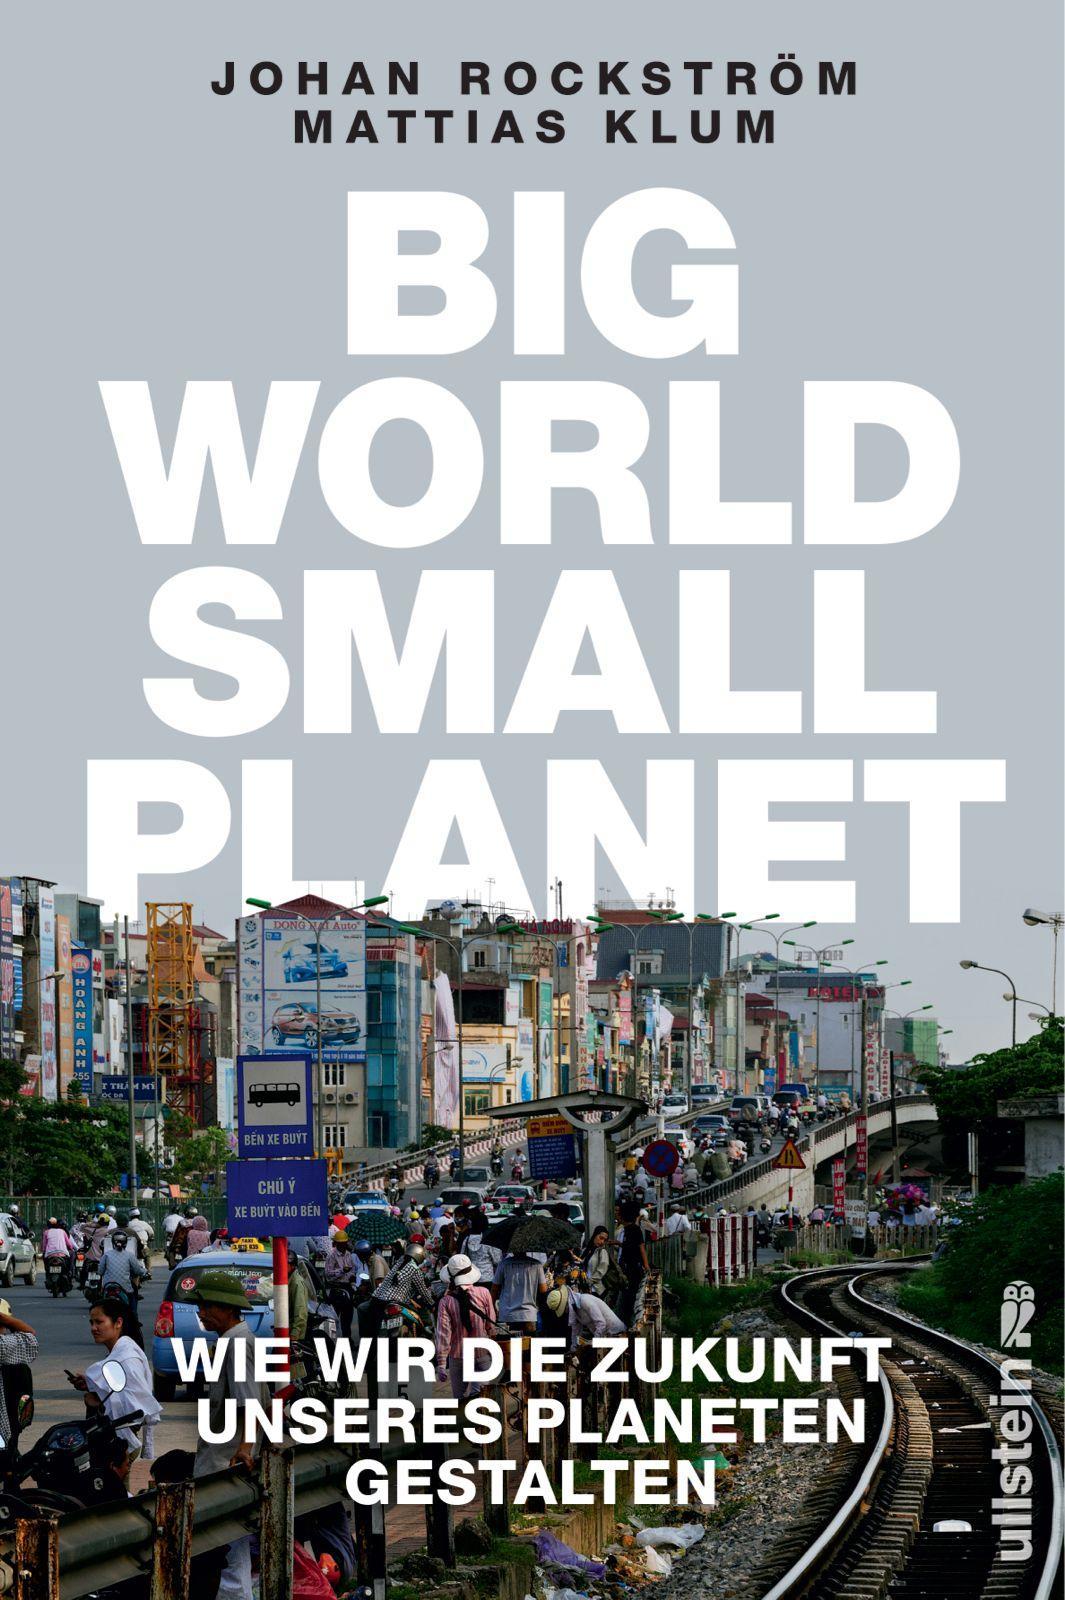 Big World Small Planet Johan Rockström